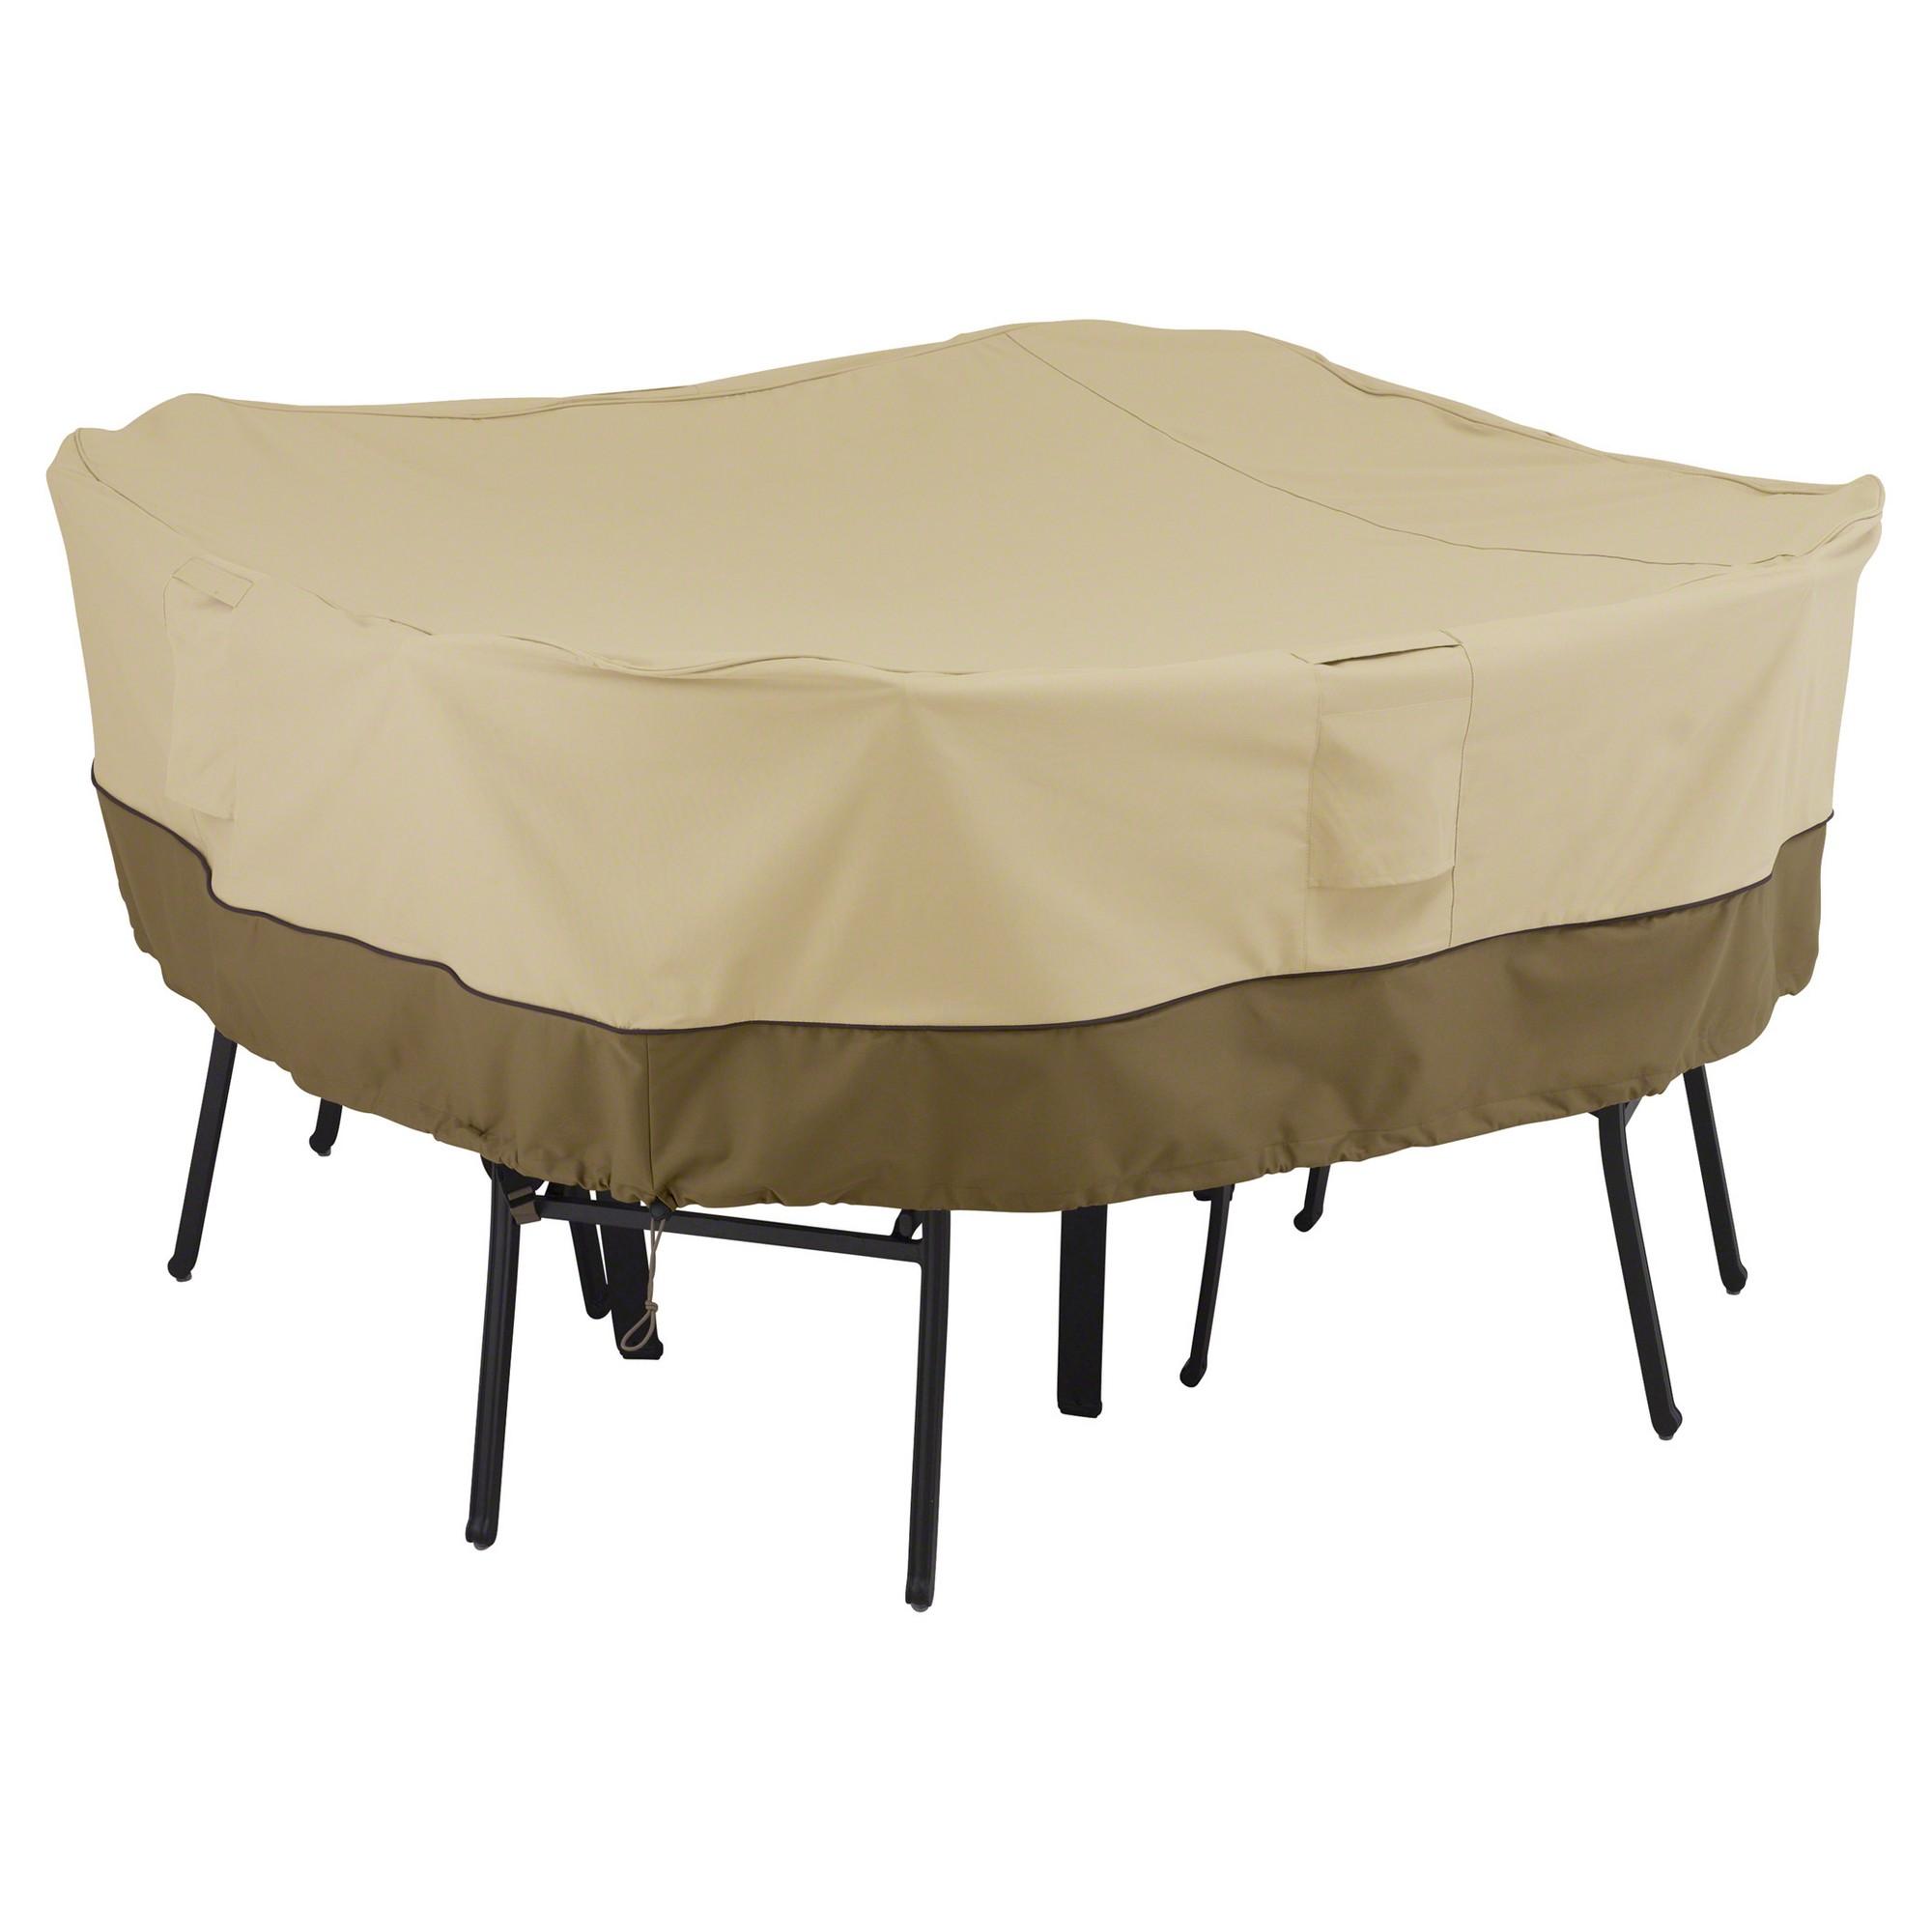 Veranda Medium Square Patio Table And 4 Chairs Cover Light Pebble Clic Accessories